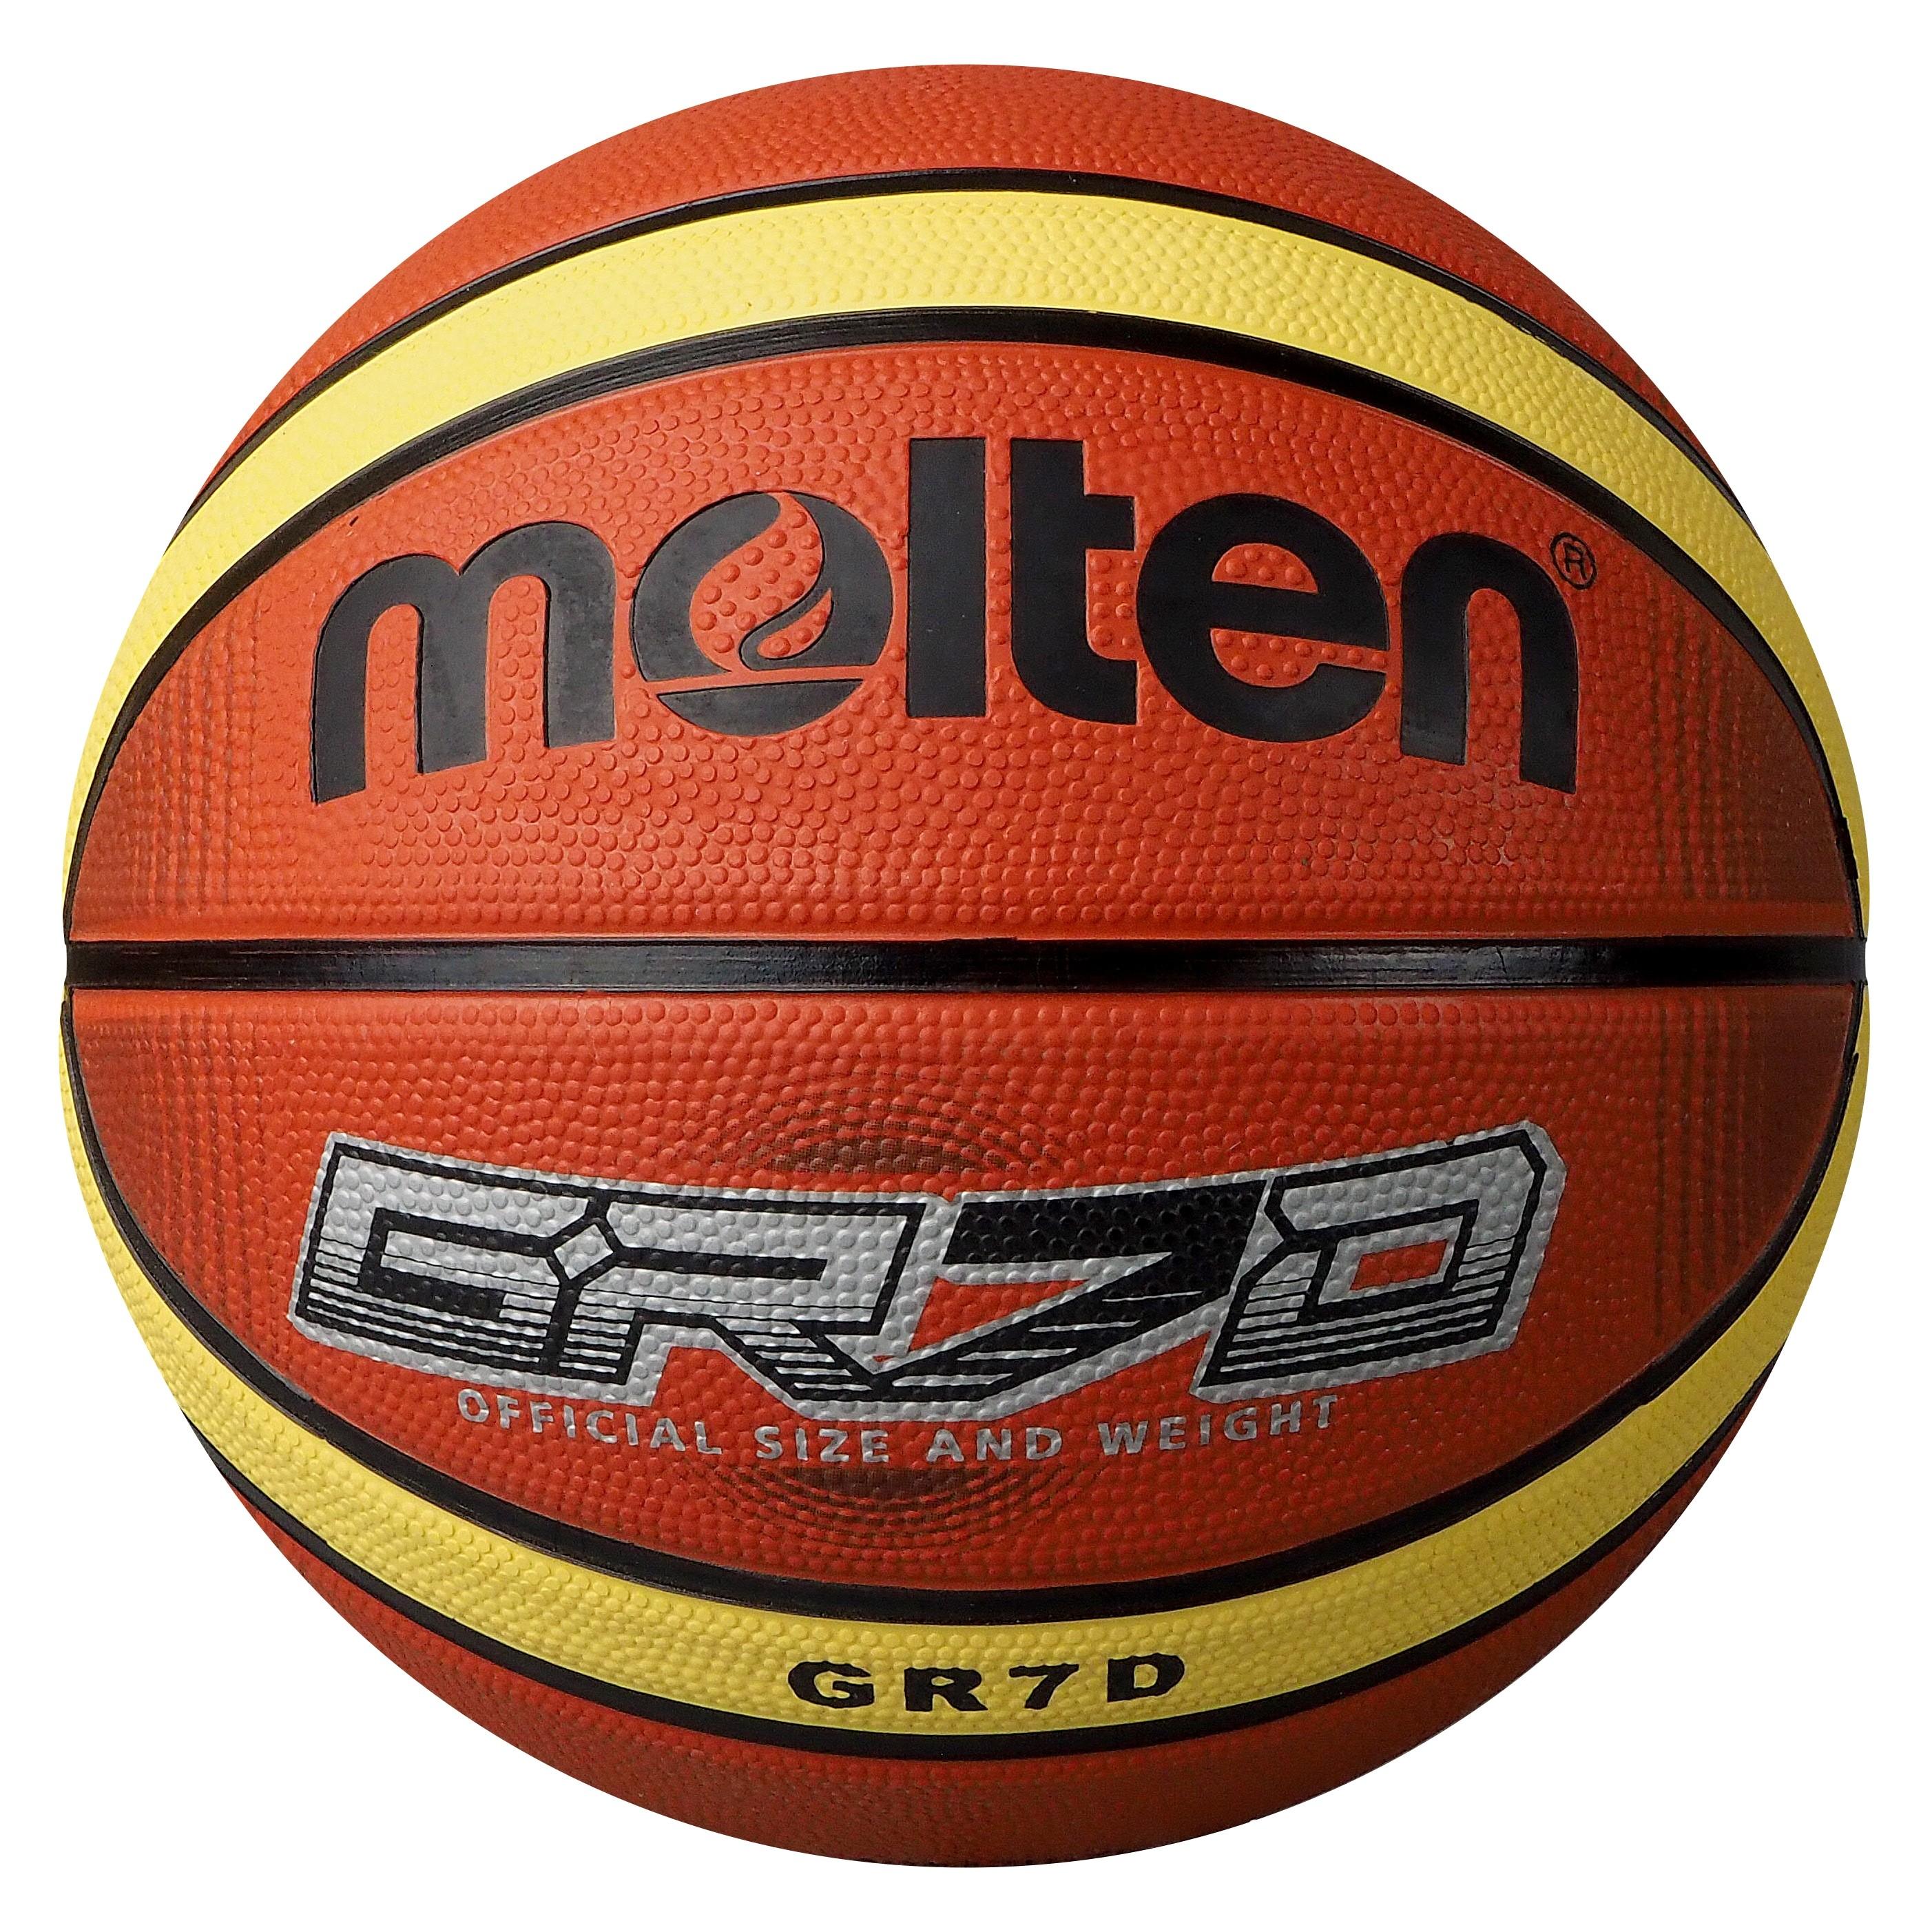 Molten BGRXD-TI Basketball BGRX7D-TI BGRX6D-TI BGRX5D-TI Main Front Image